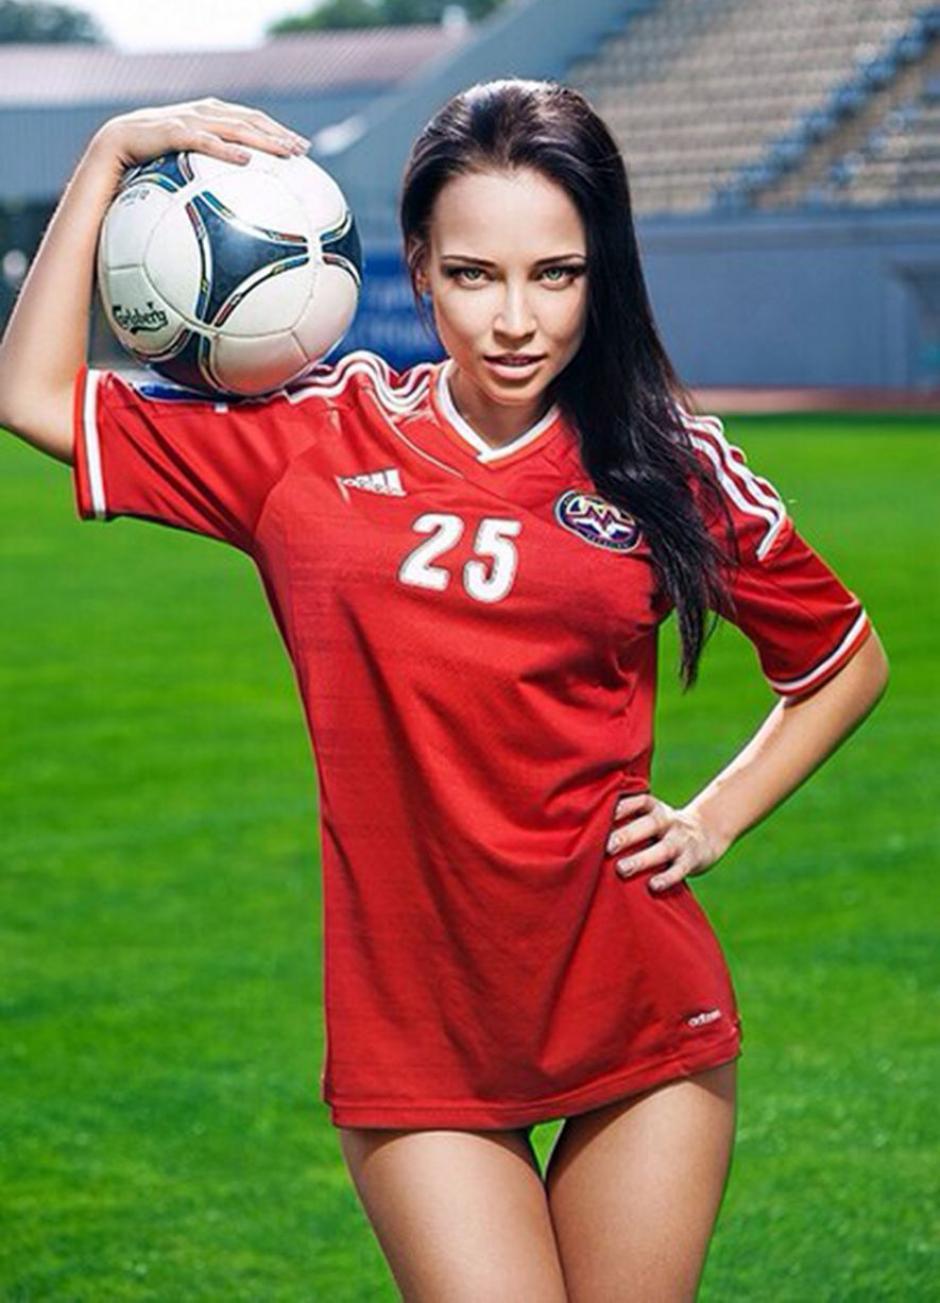 Angelina Petrova se desnuda por su club foto 02